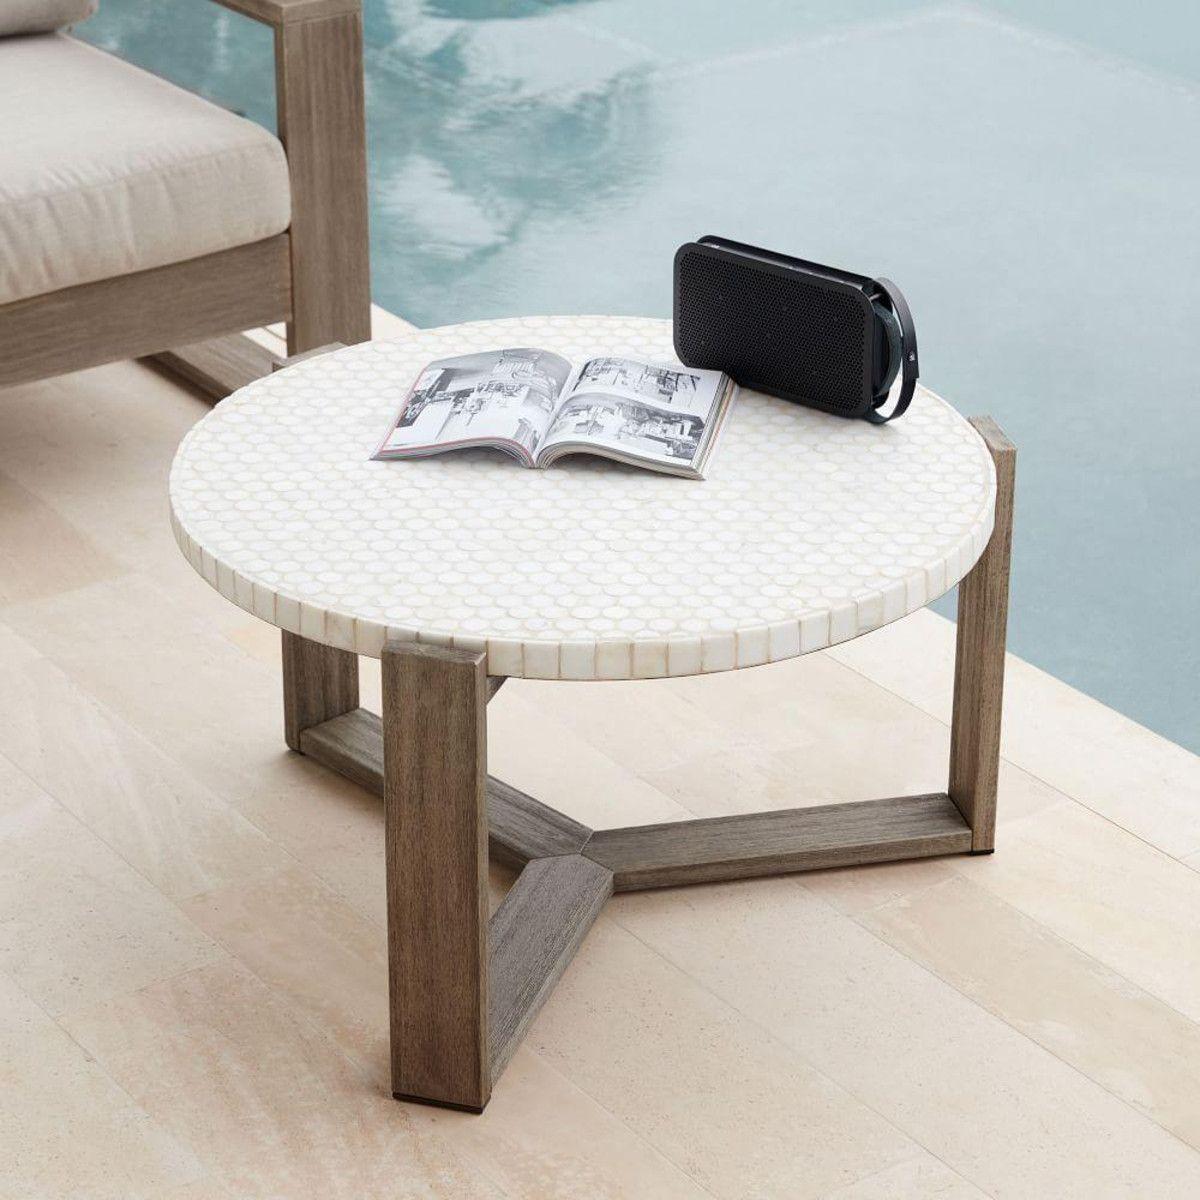 mosaic coffee table white marble weathered grey base modern rh pinterest com